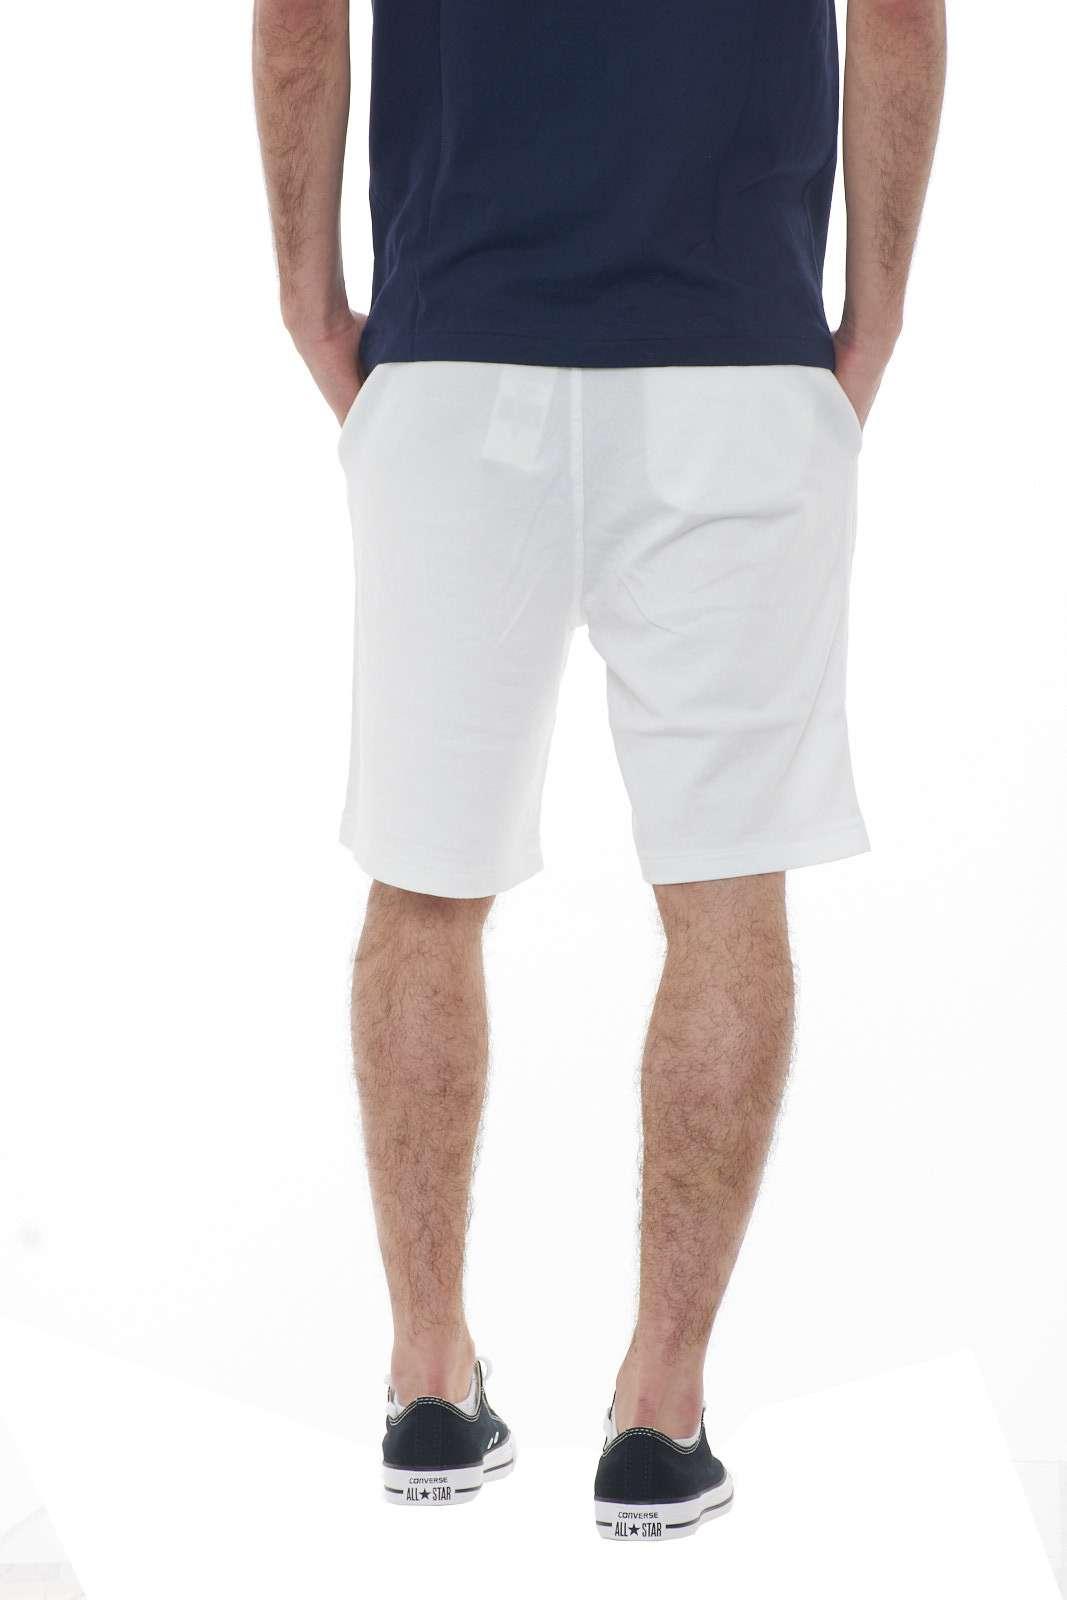 https://www.parmax.com/media/catalog/product/a/i/PE-outlet_parmax-pantaloncini-uomo-Ralph-Lauren-710704271004-C.jpg